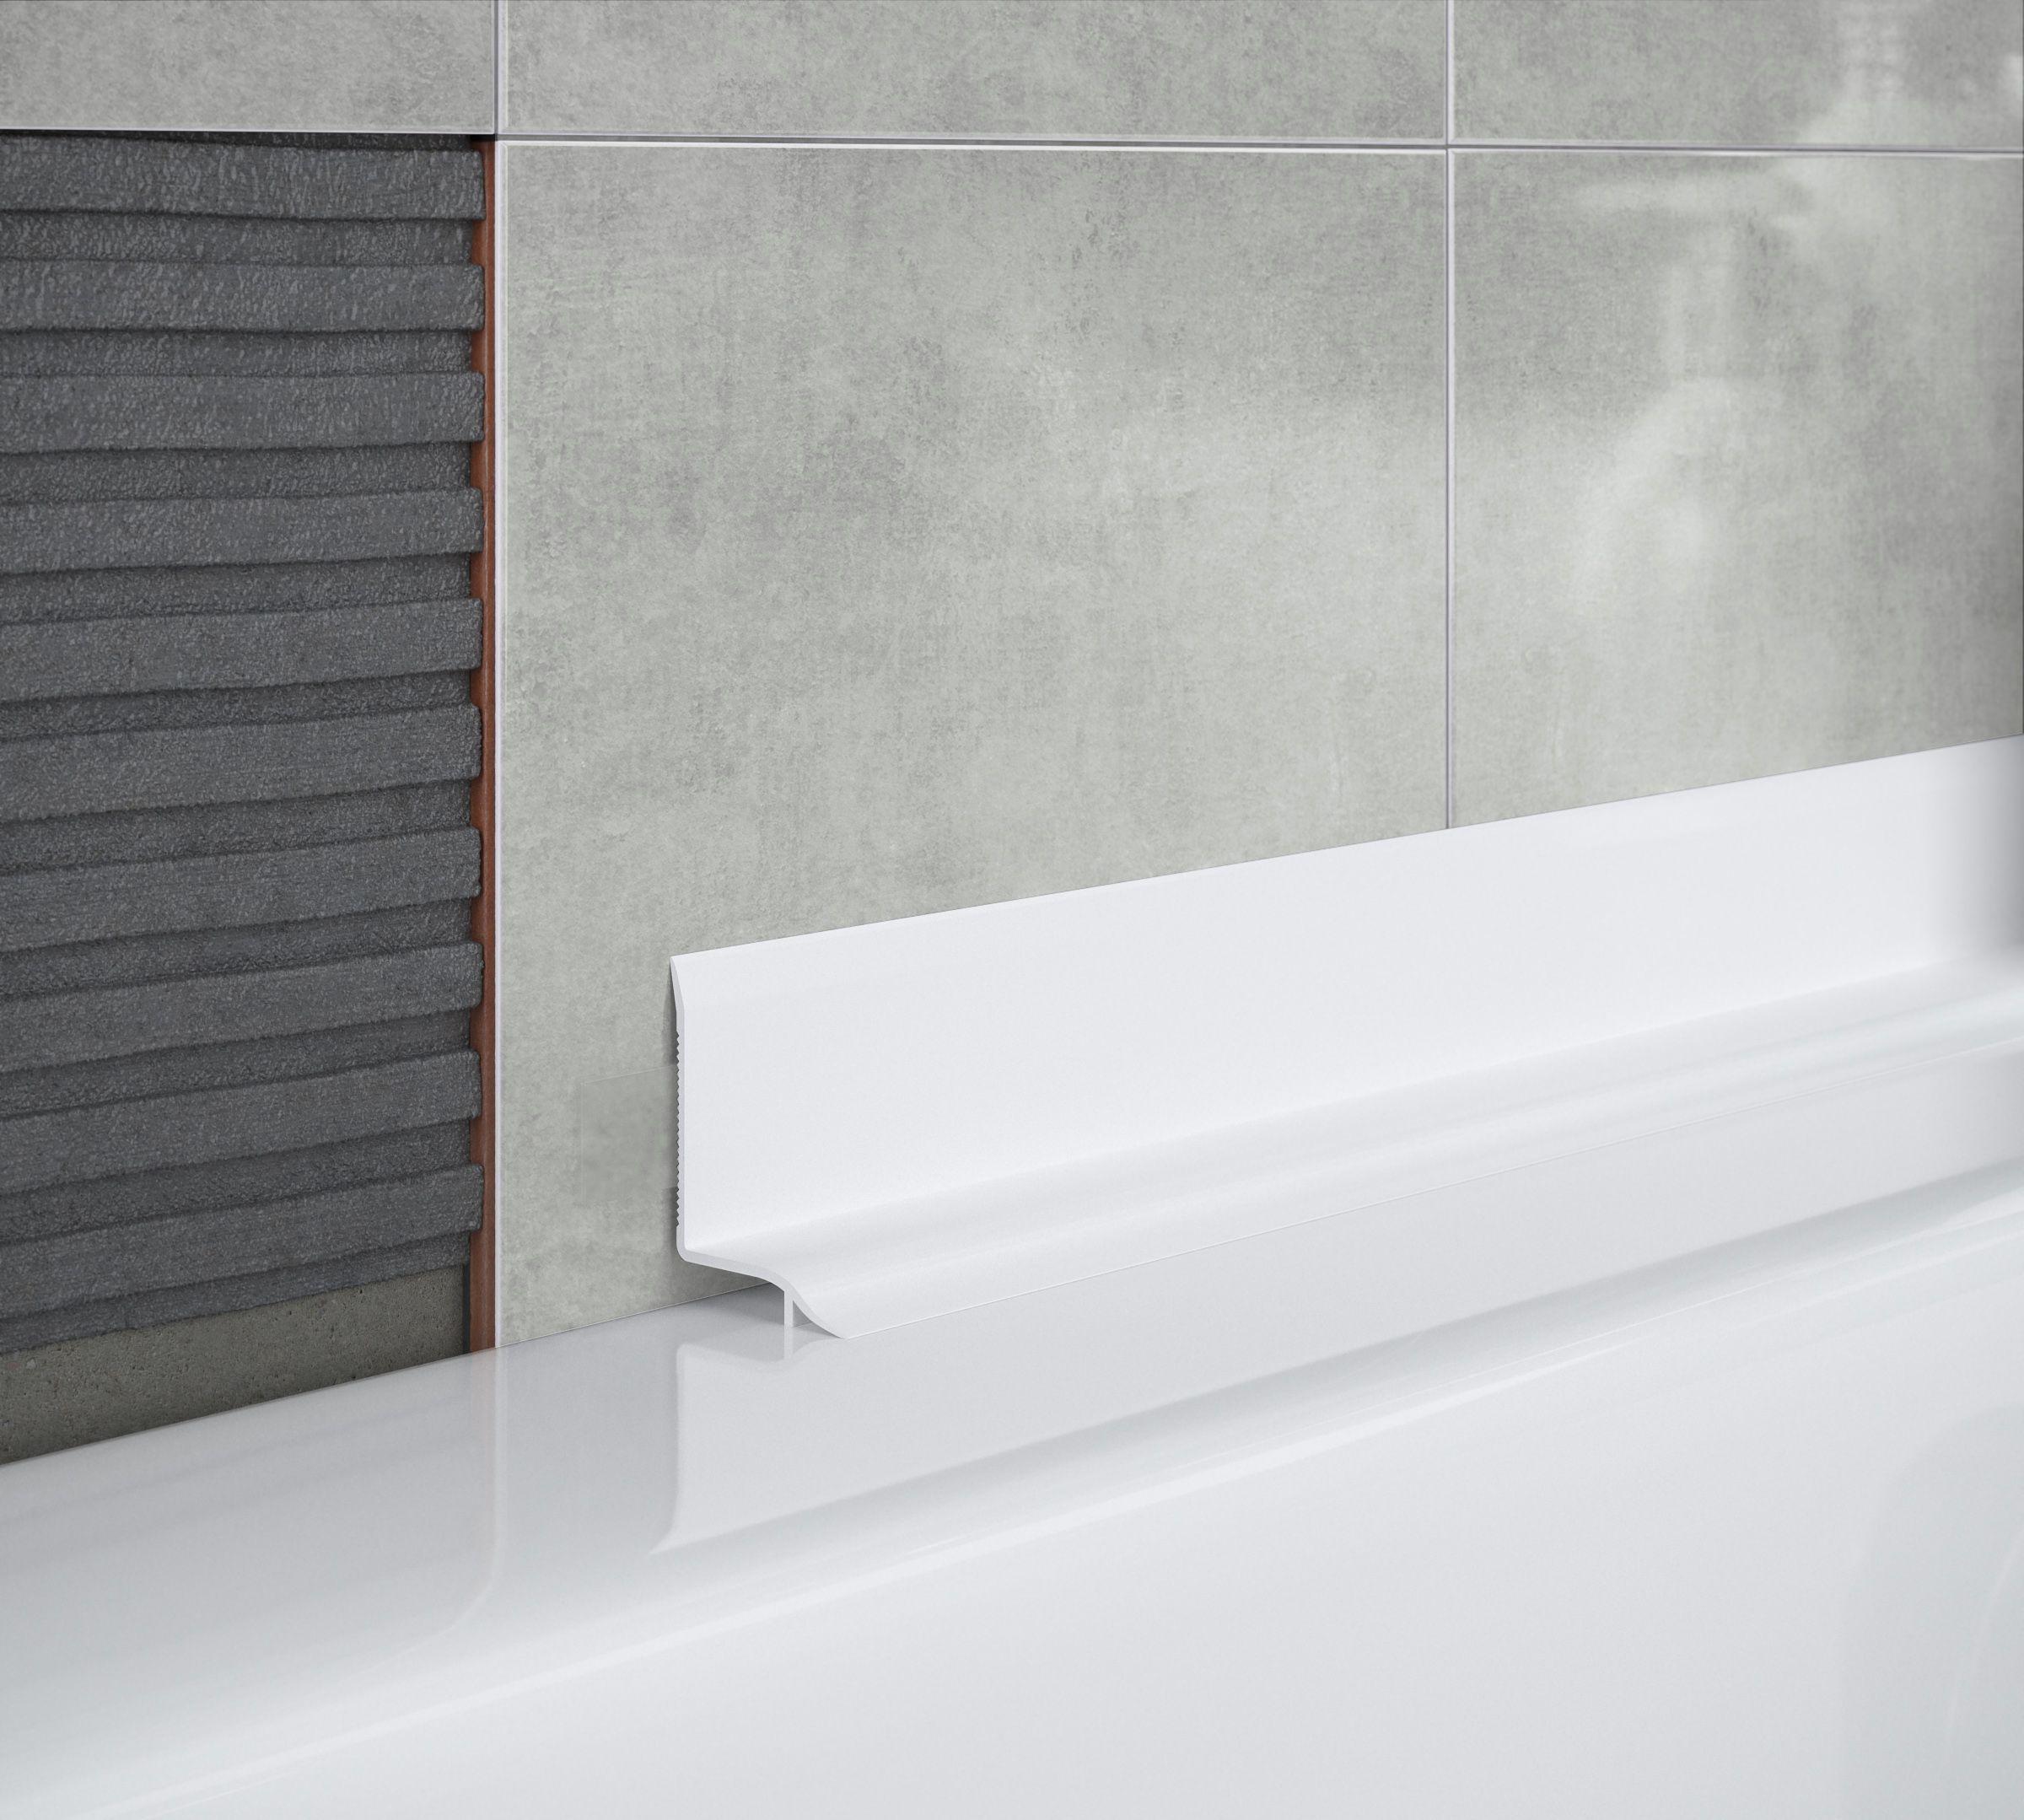 Perfect Self Adhesive Curved Bath Seal Trim